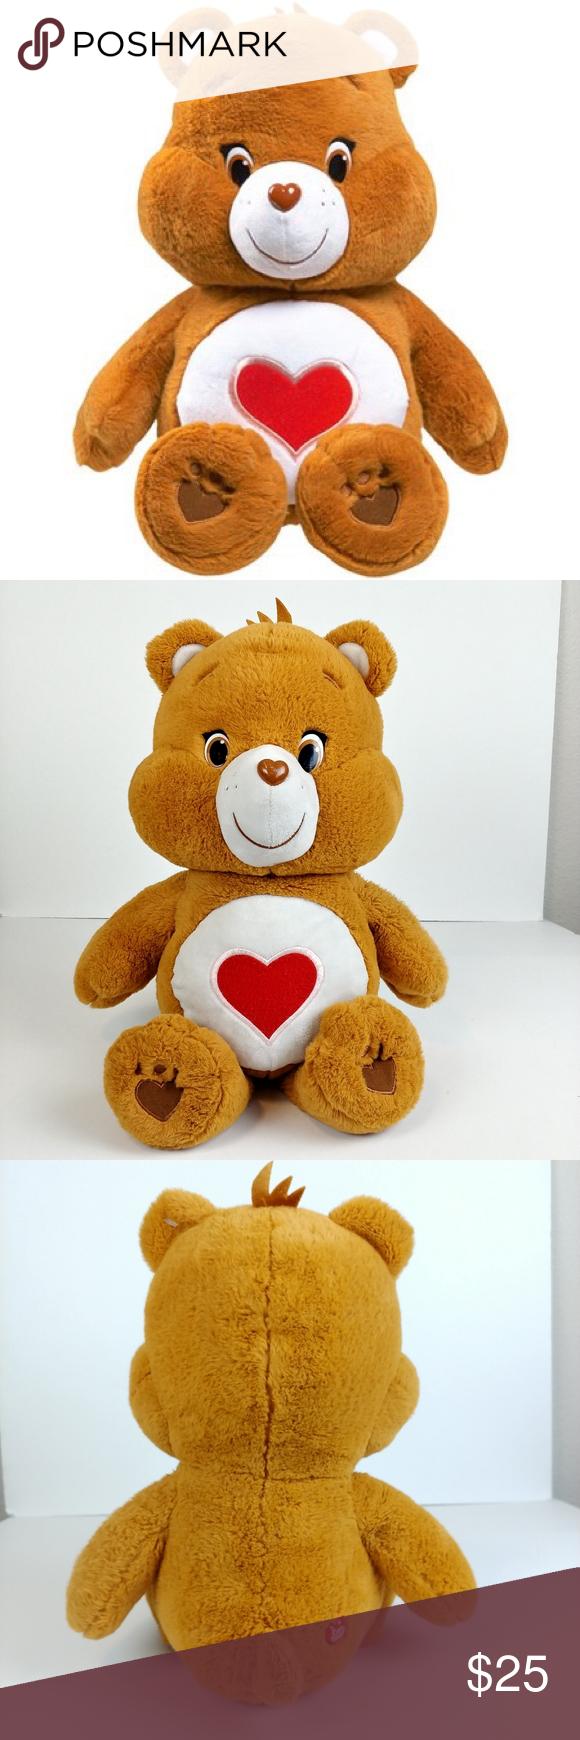 Original Tender Heart Large Care Bear In 2020 Care Bear Kids Accessories Bear